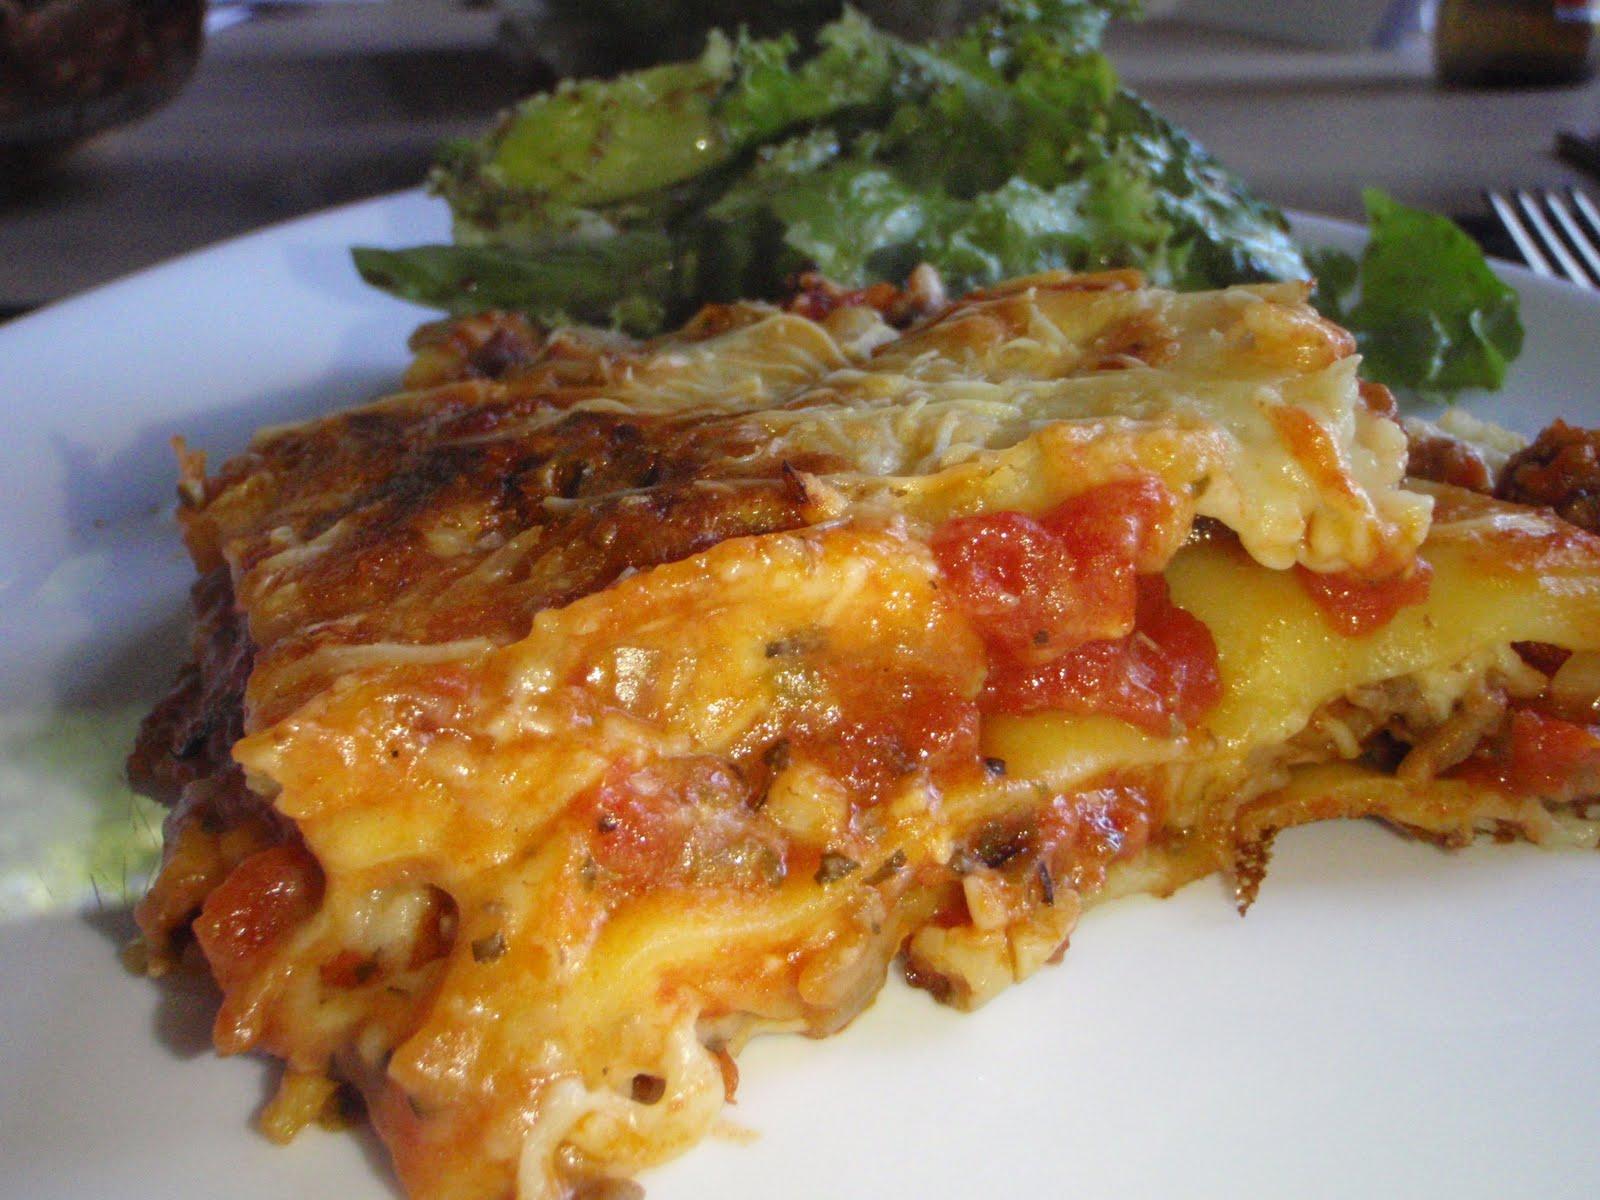 made my lasagna again... always so good. I added a little nutmeg in ...